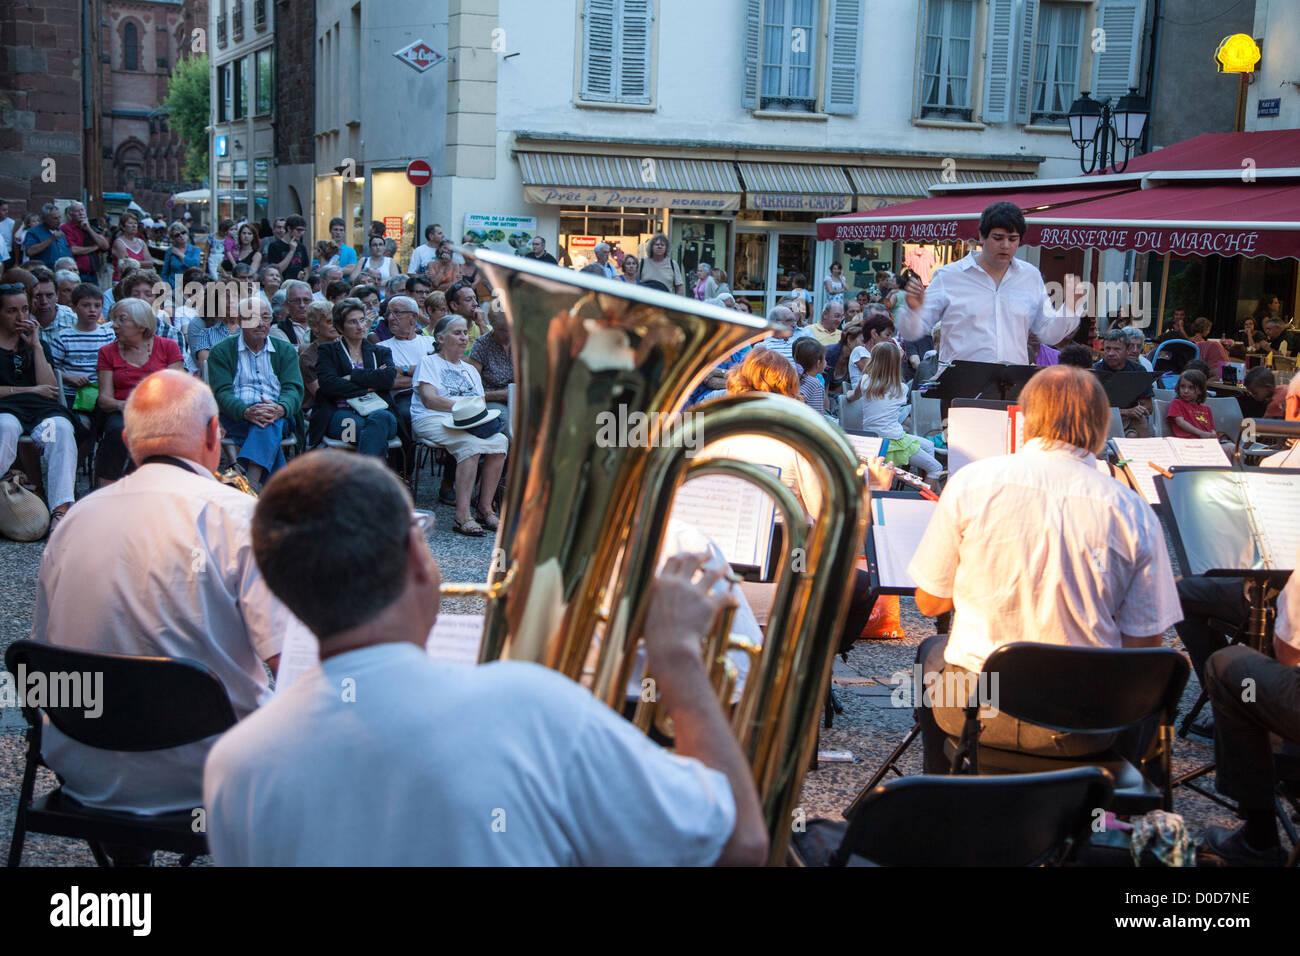 Entretenimiento musical LA NOCHE MERCADO GRANJERO ESPALION AVEYRON (12) Francia Imagen De Stock